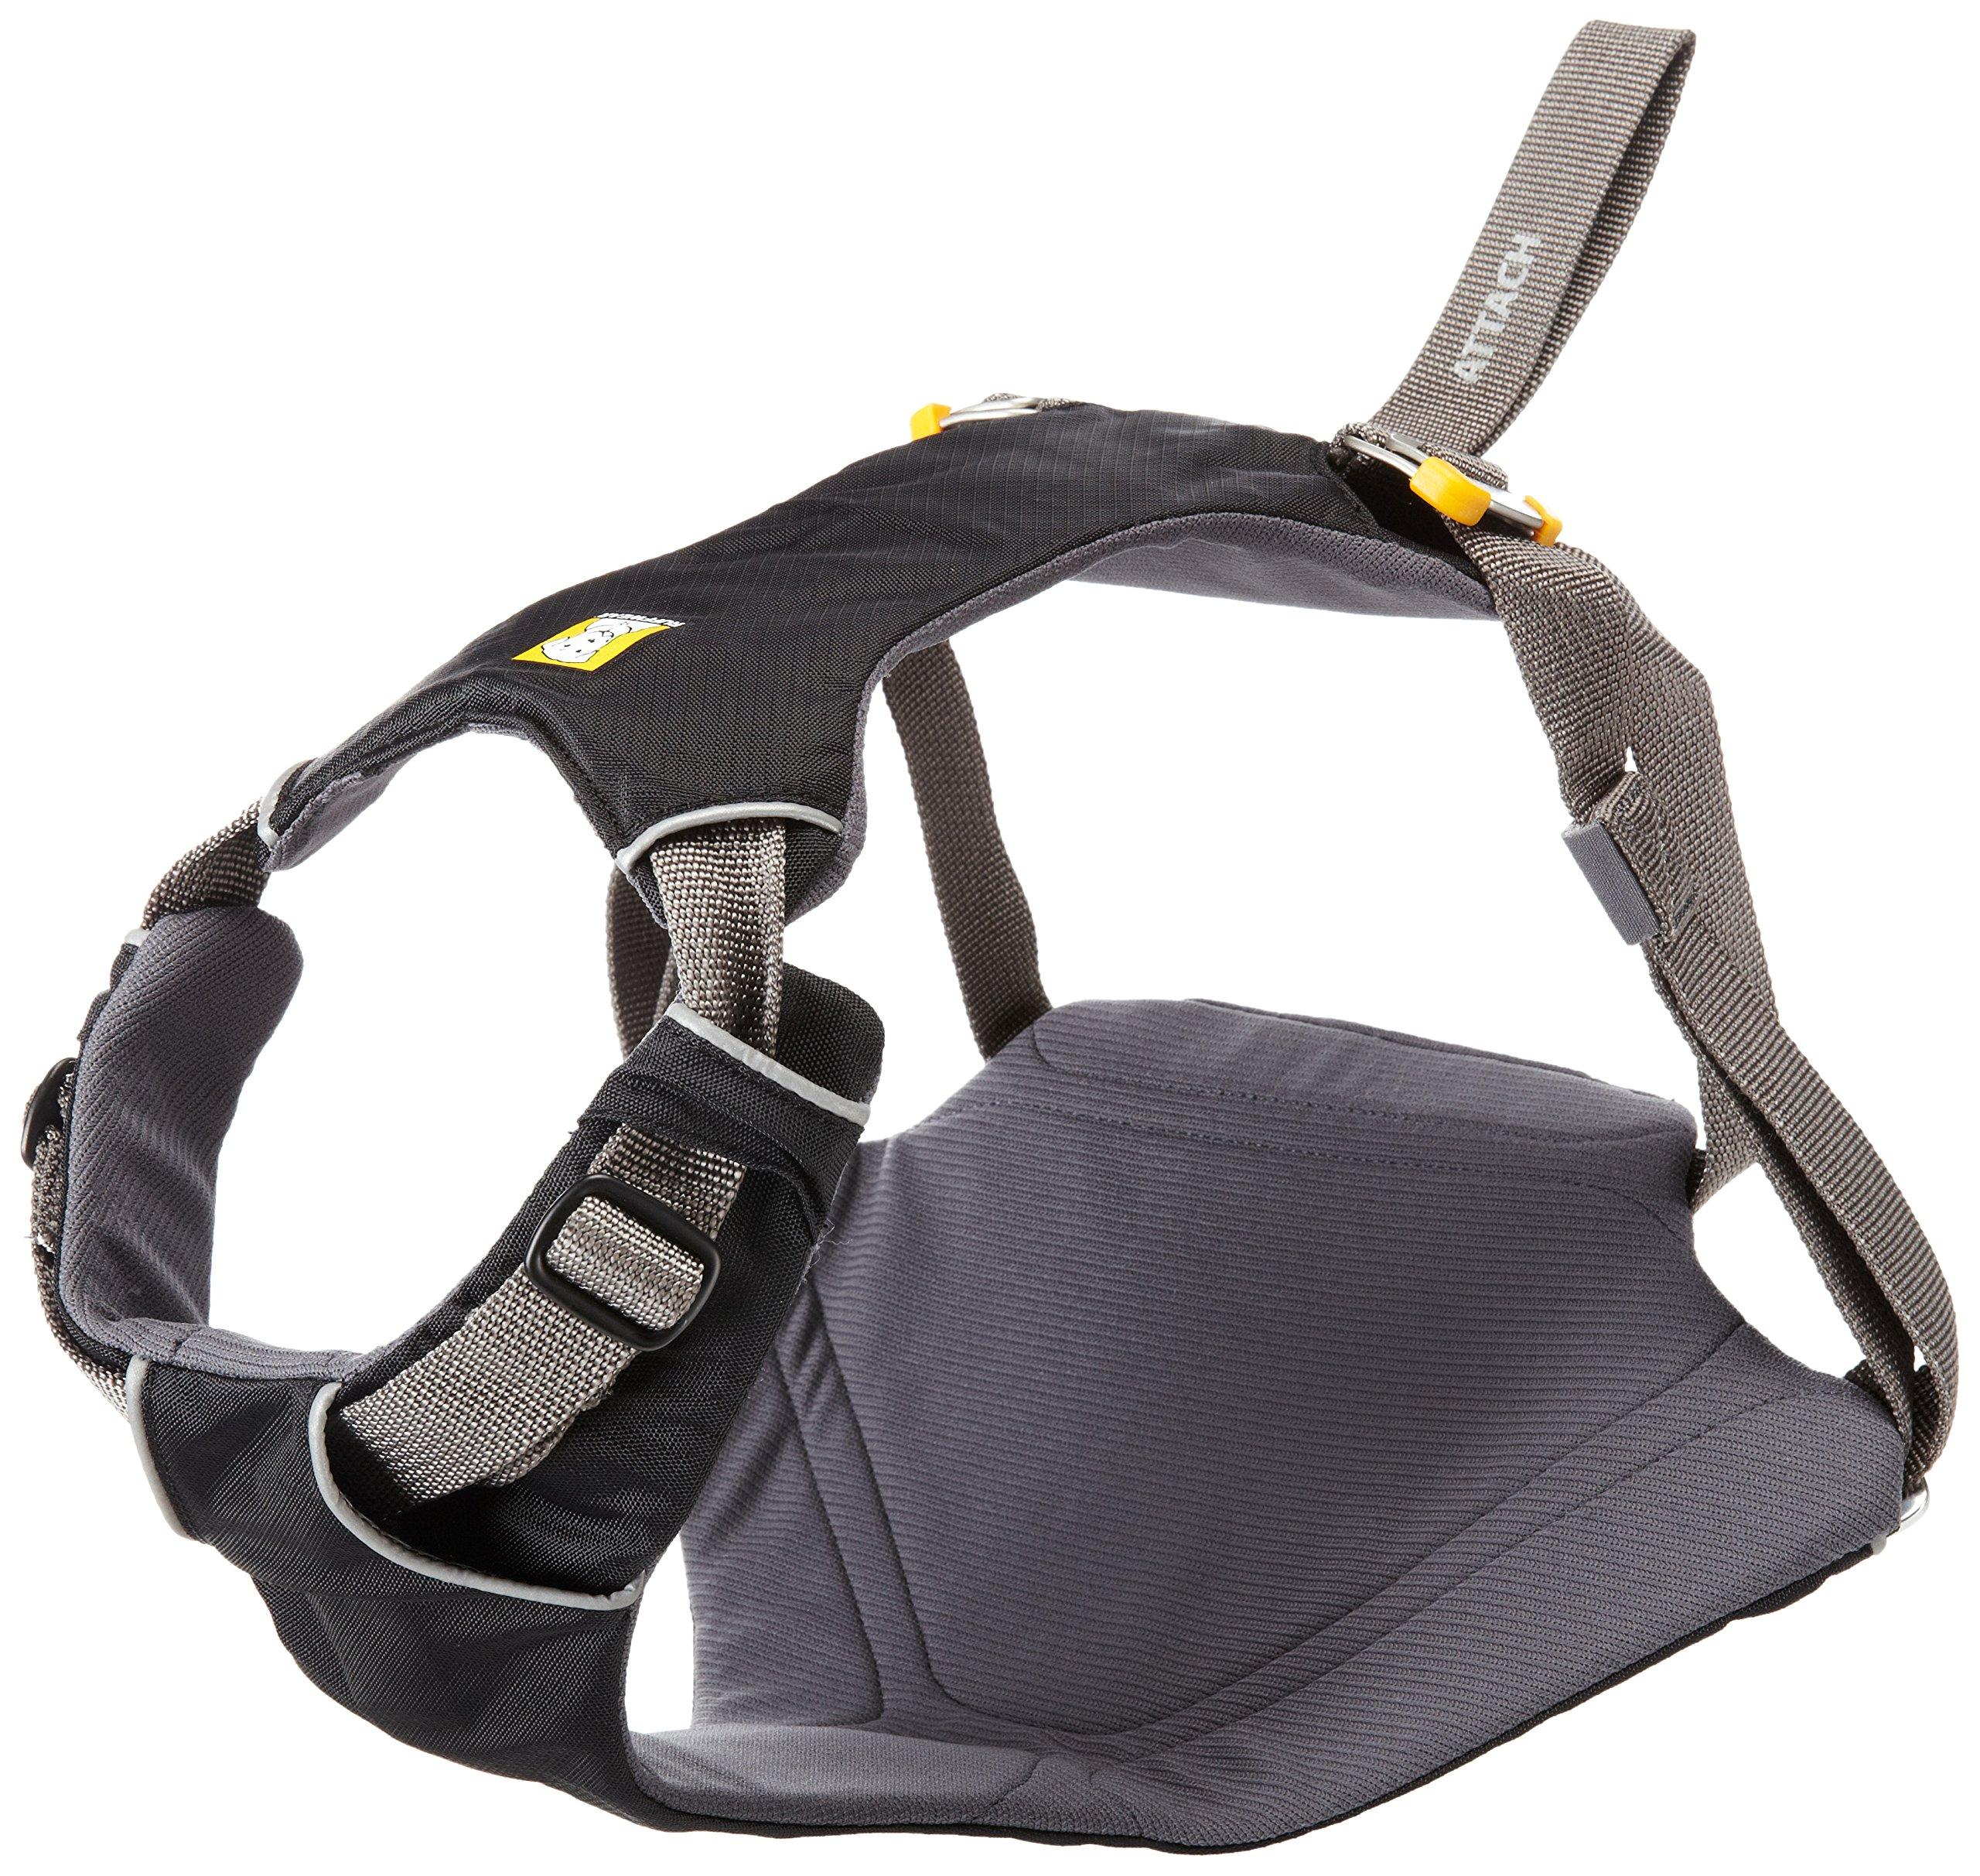 Ruffwear - Load Up Vehicle Restraint Harness for Dogs, Obsidian Black, Medium